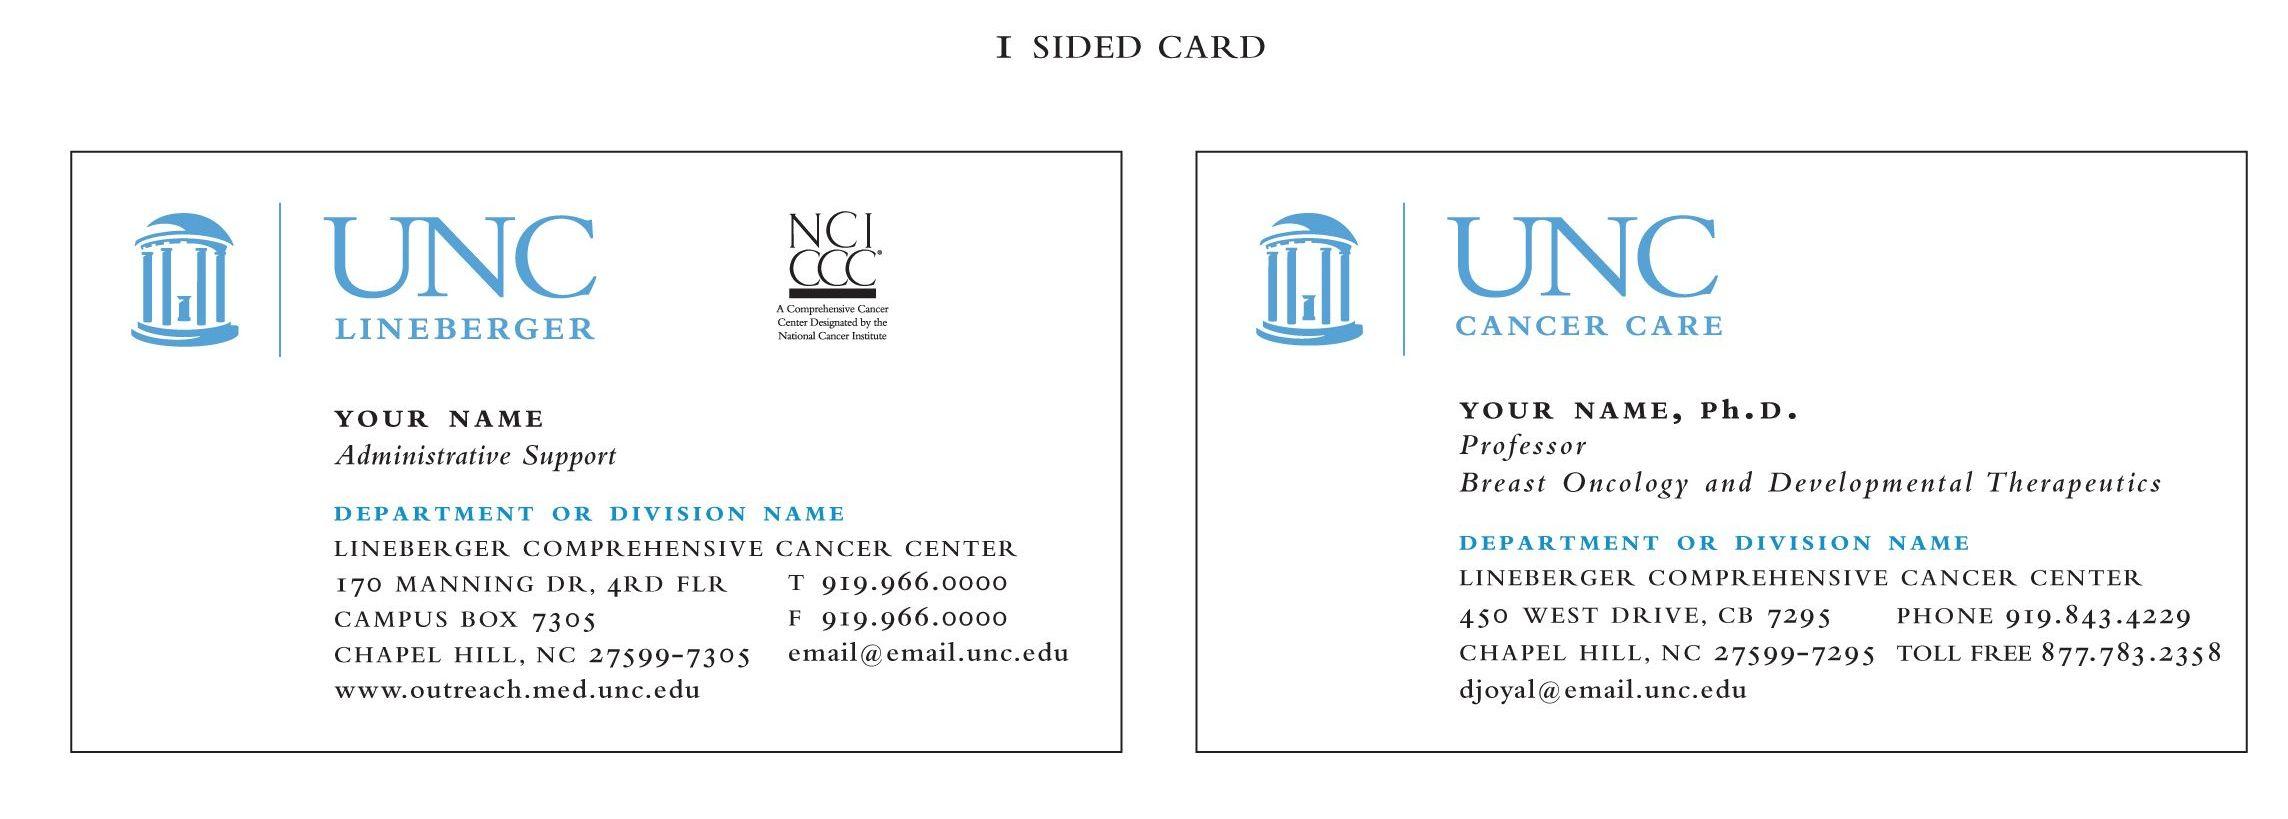 one sided business cards — unc lineberger comprehensive cancer center, Presentation templates